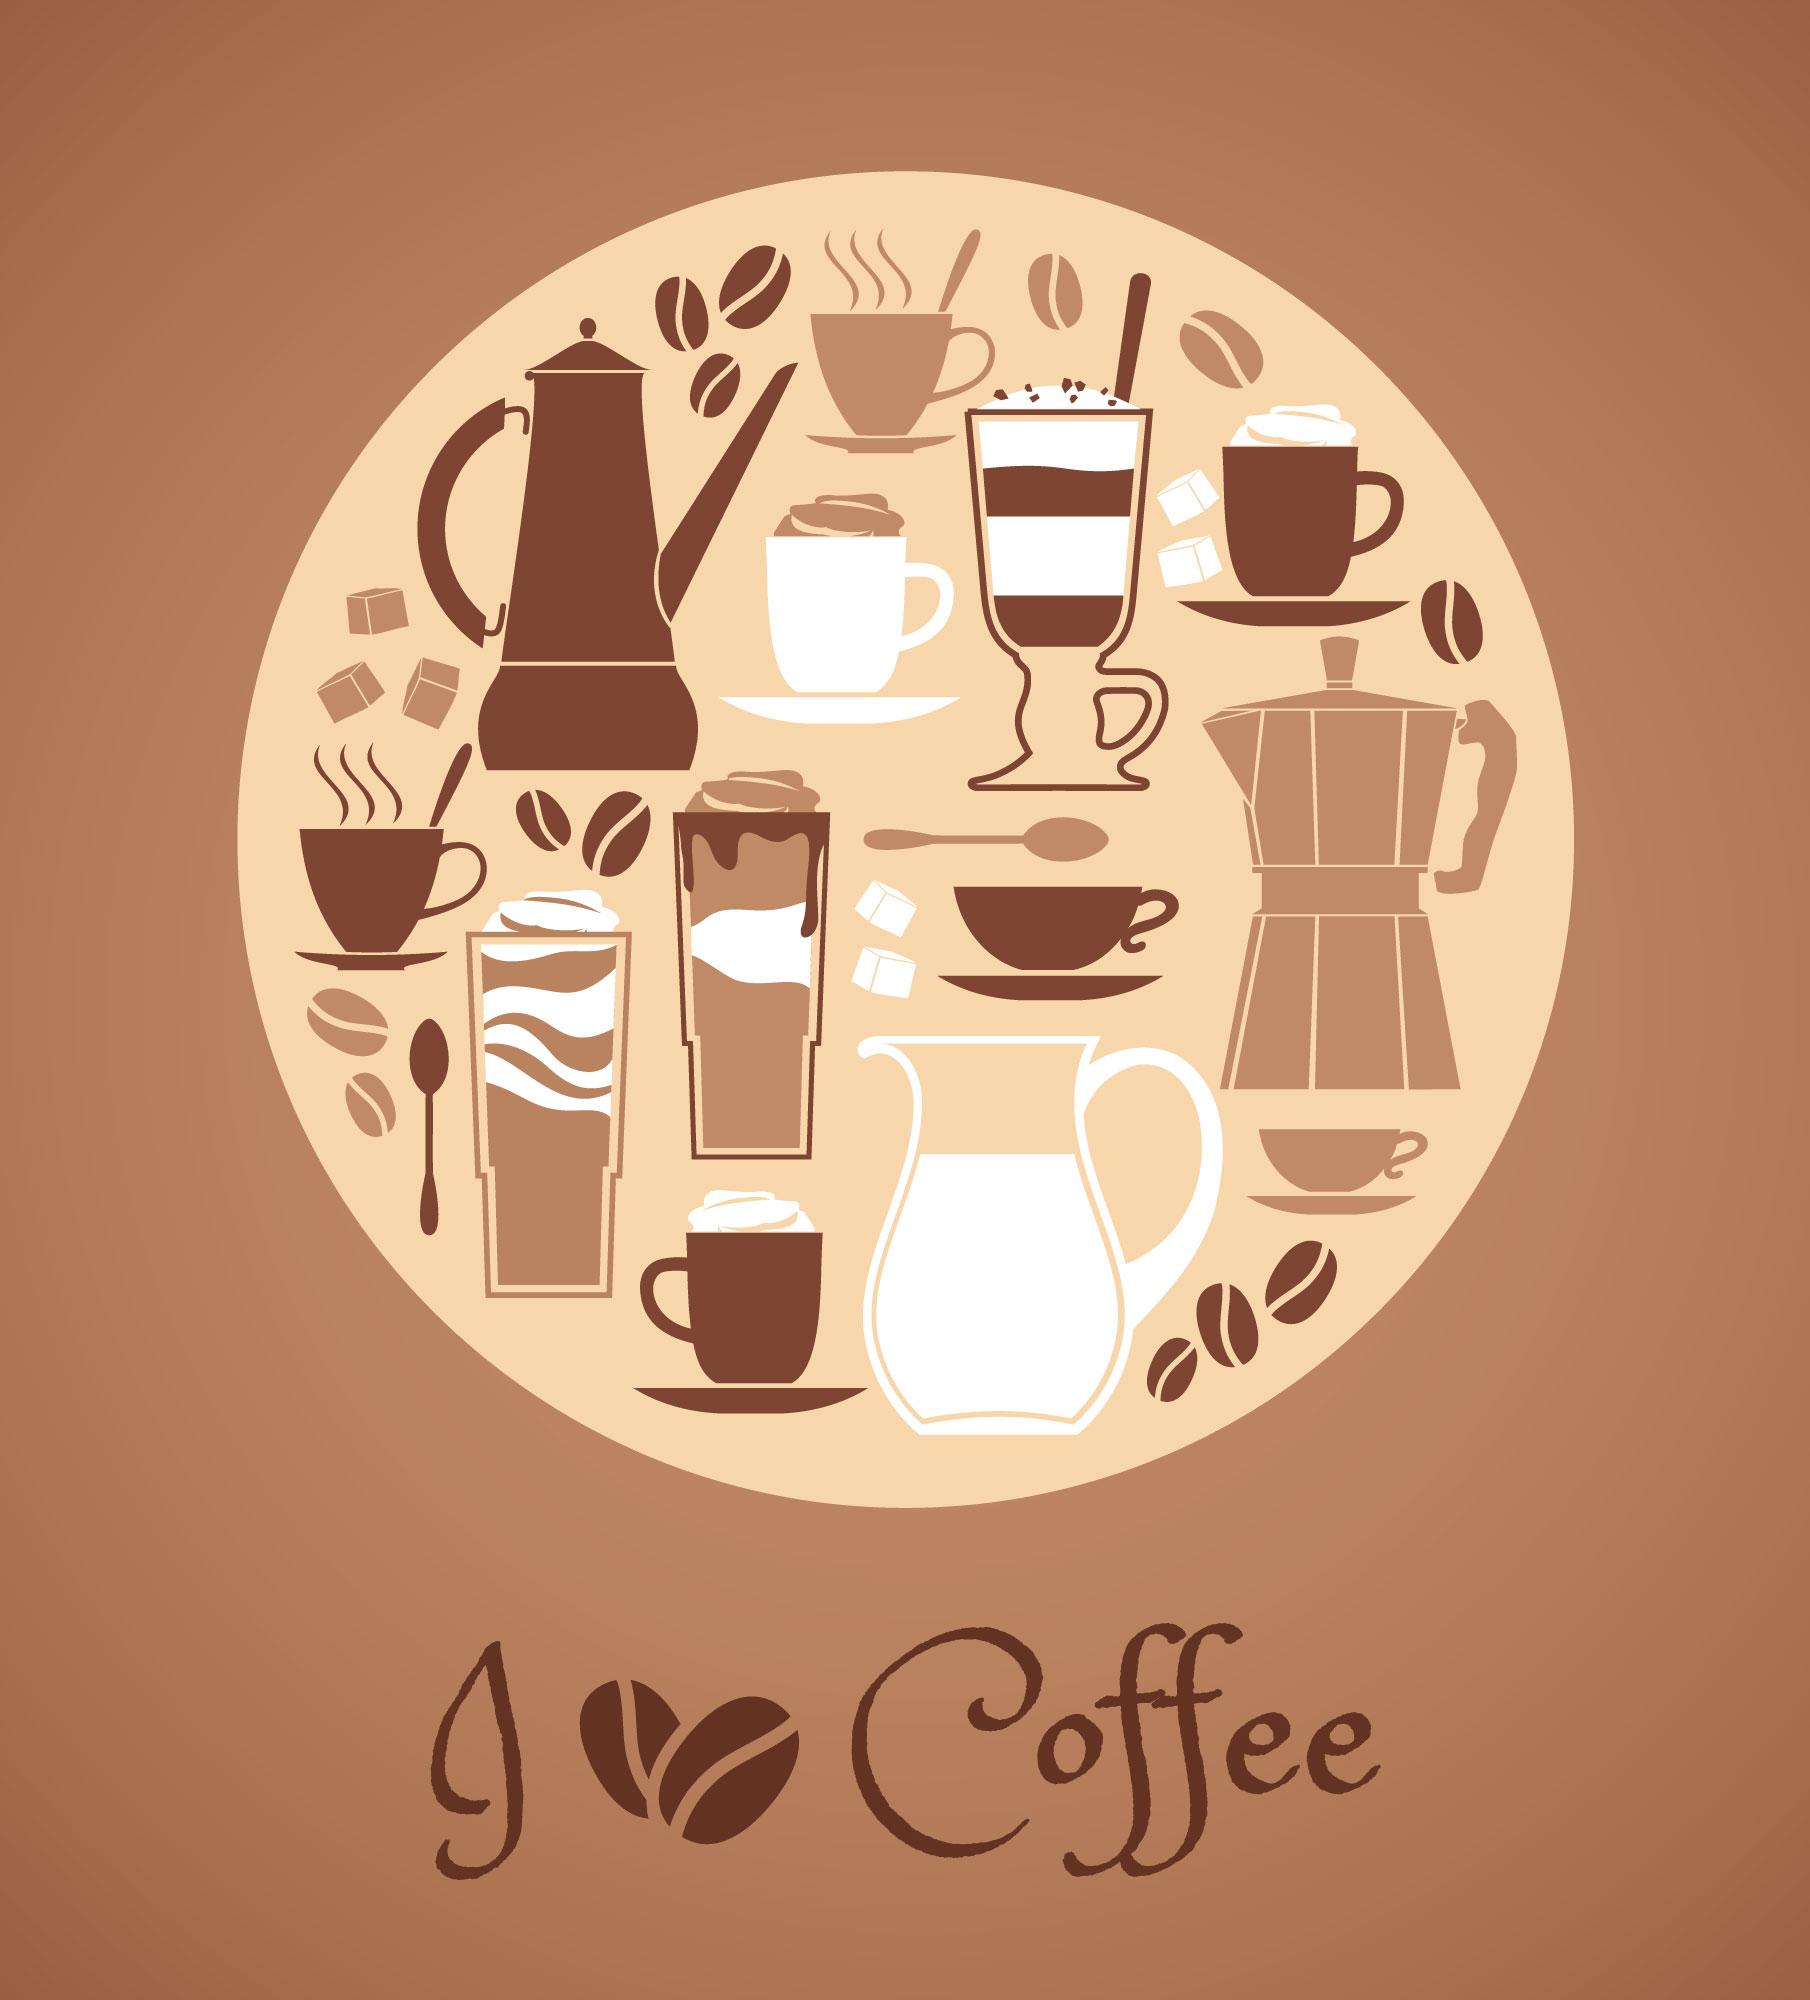 Vector illustration of coffee design elements. Photoshop brush